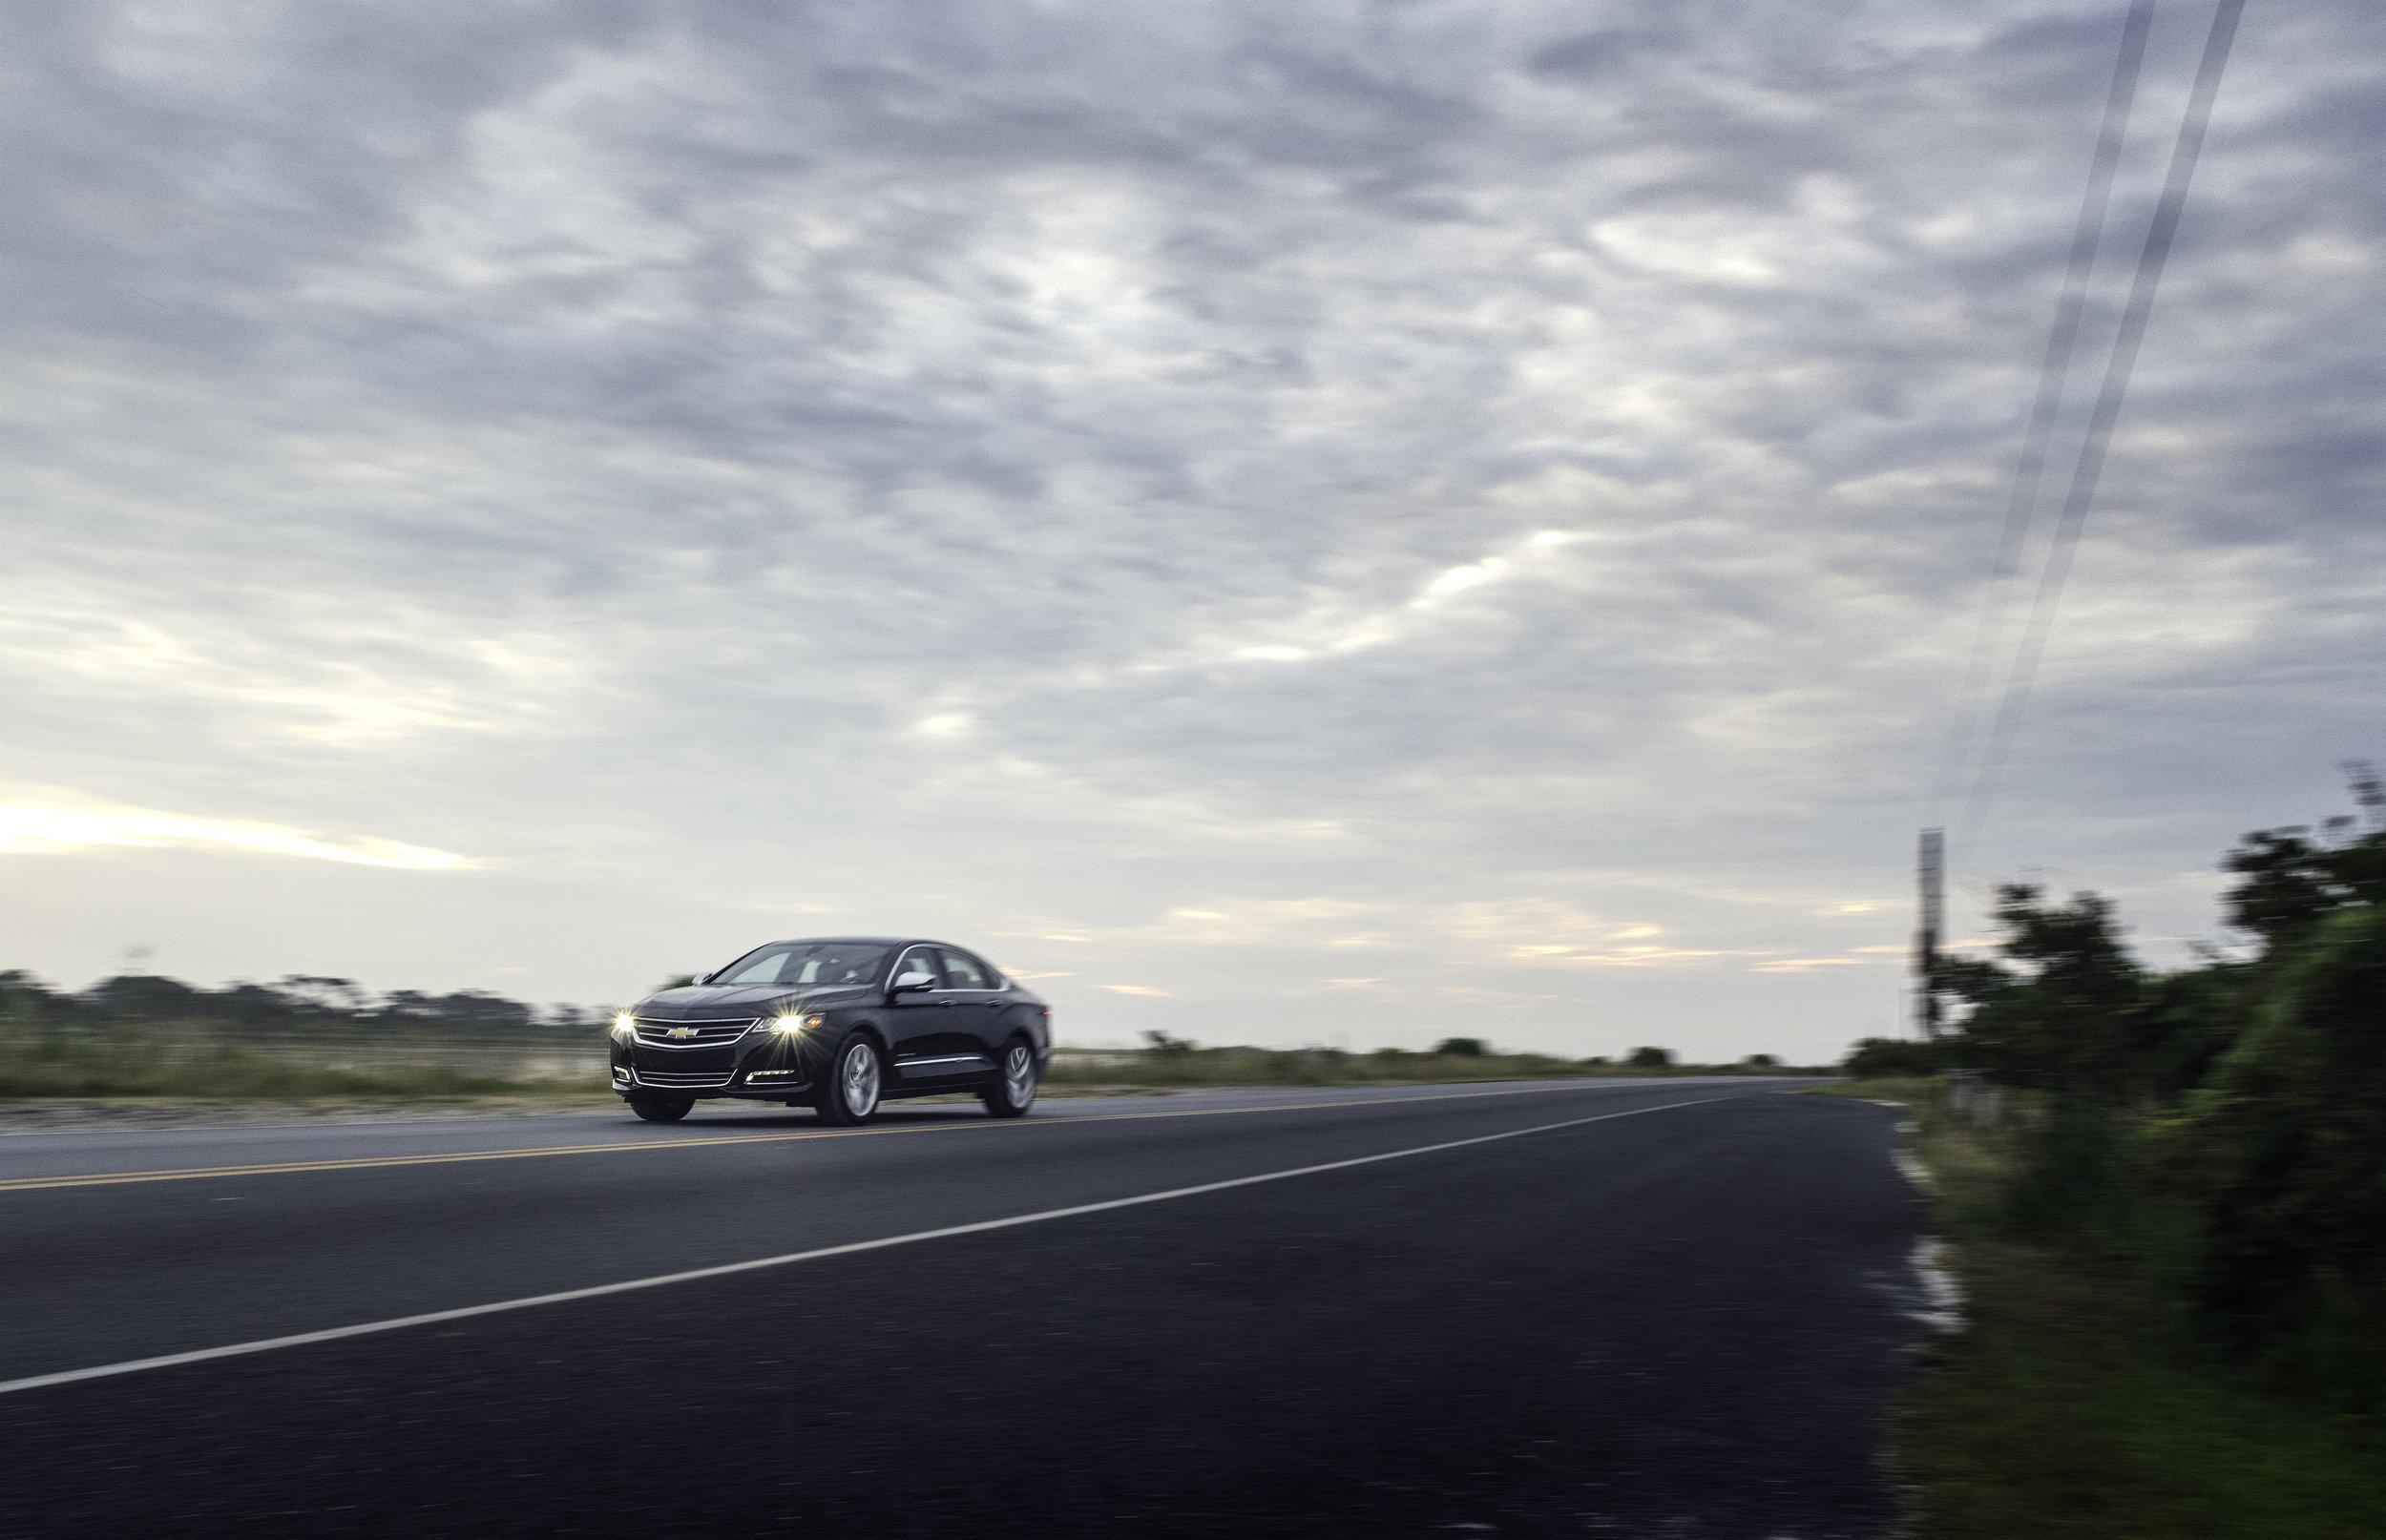 Impala Passing Road small file.jpg